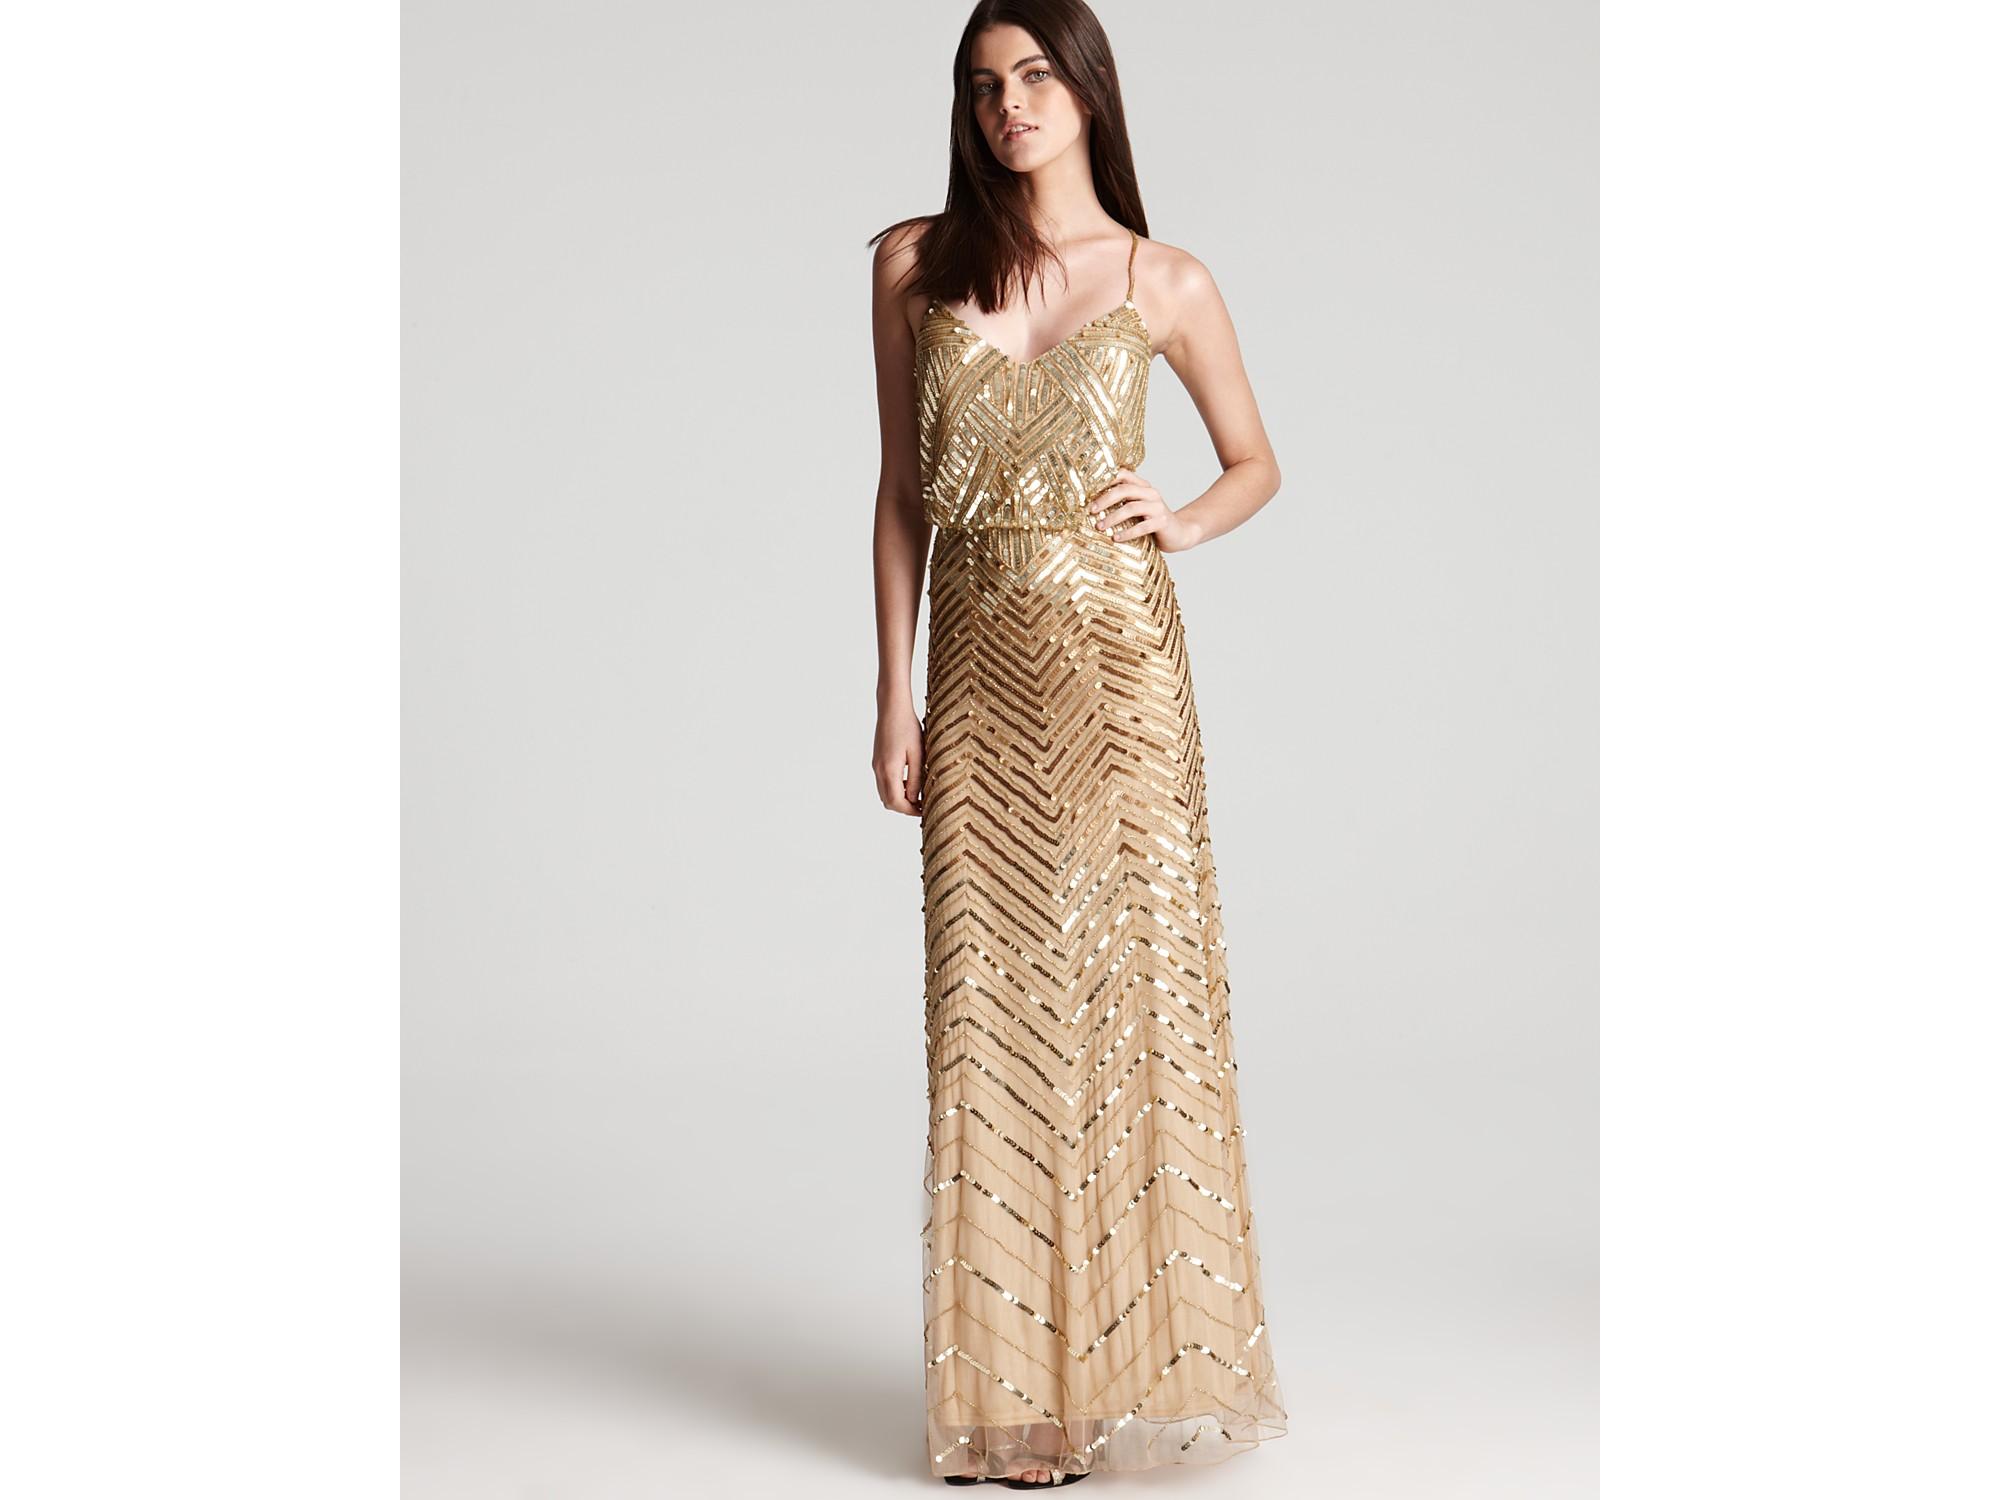 Lyst - Adrianna Papell Beaded Gown Sleeveless V Neck Blouson in Metallic